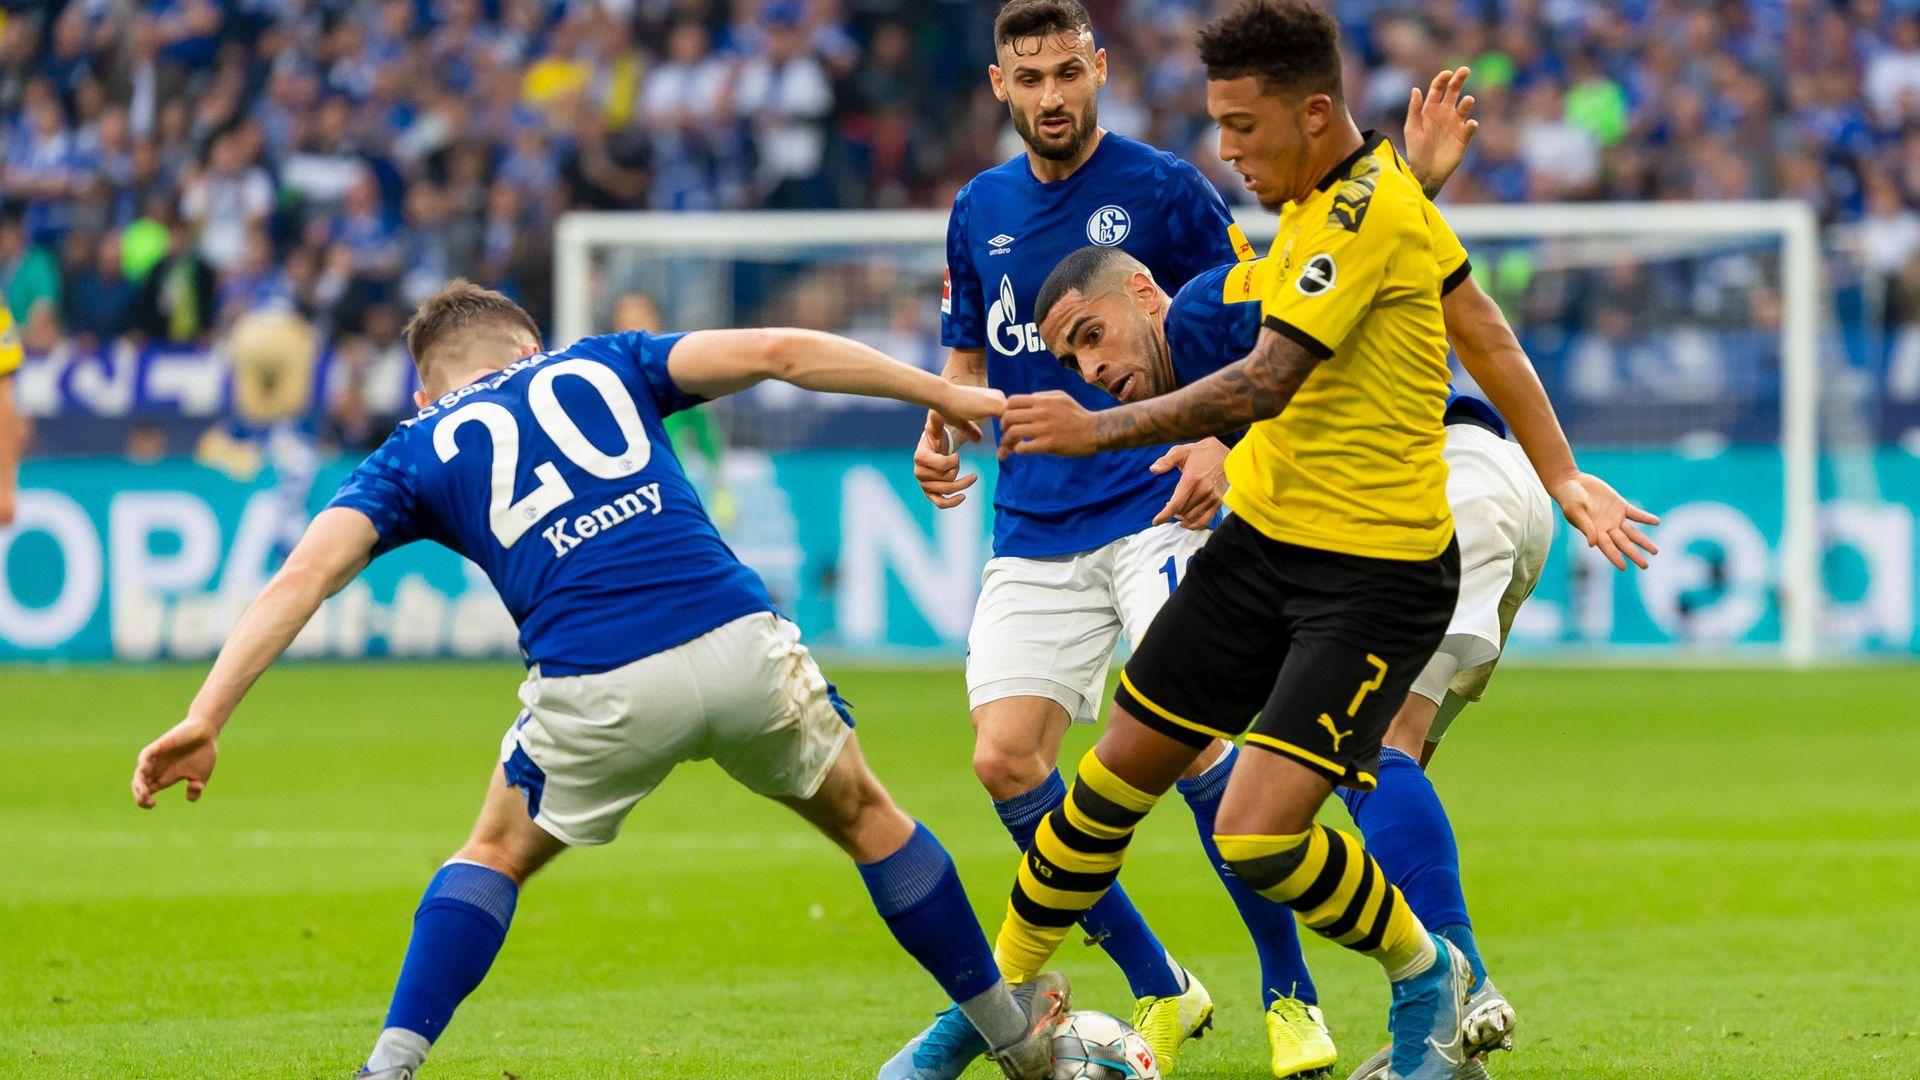 Bundesliga return: 'Eyes of the world' will be watching